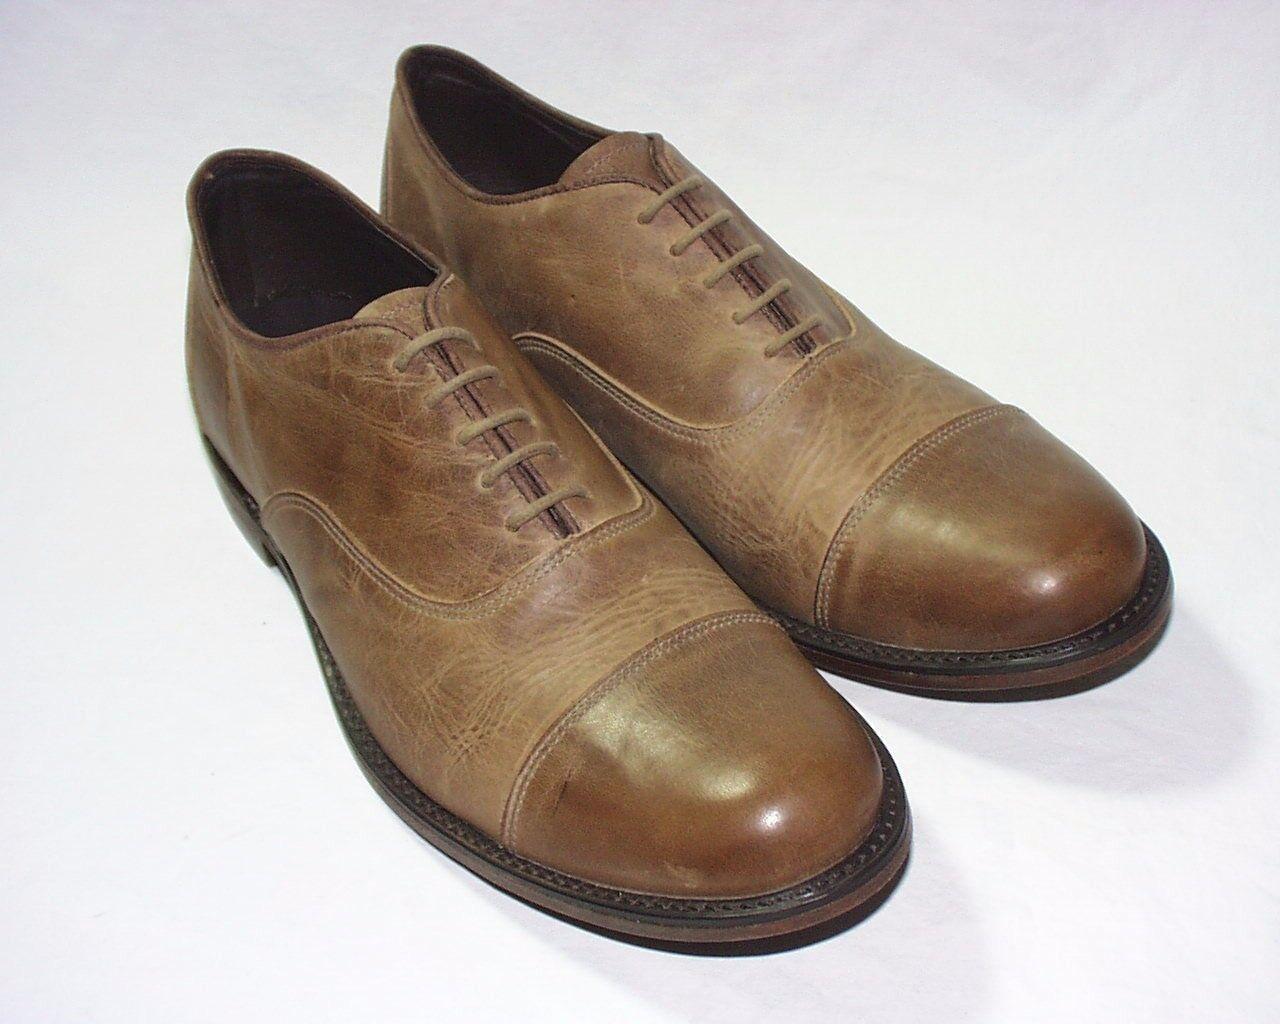 Vintage Shoe Company Barron Cap Toe Oxfords Distressed Leather Upper Tan New